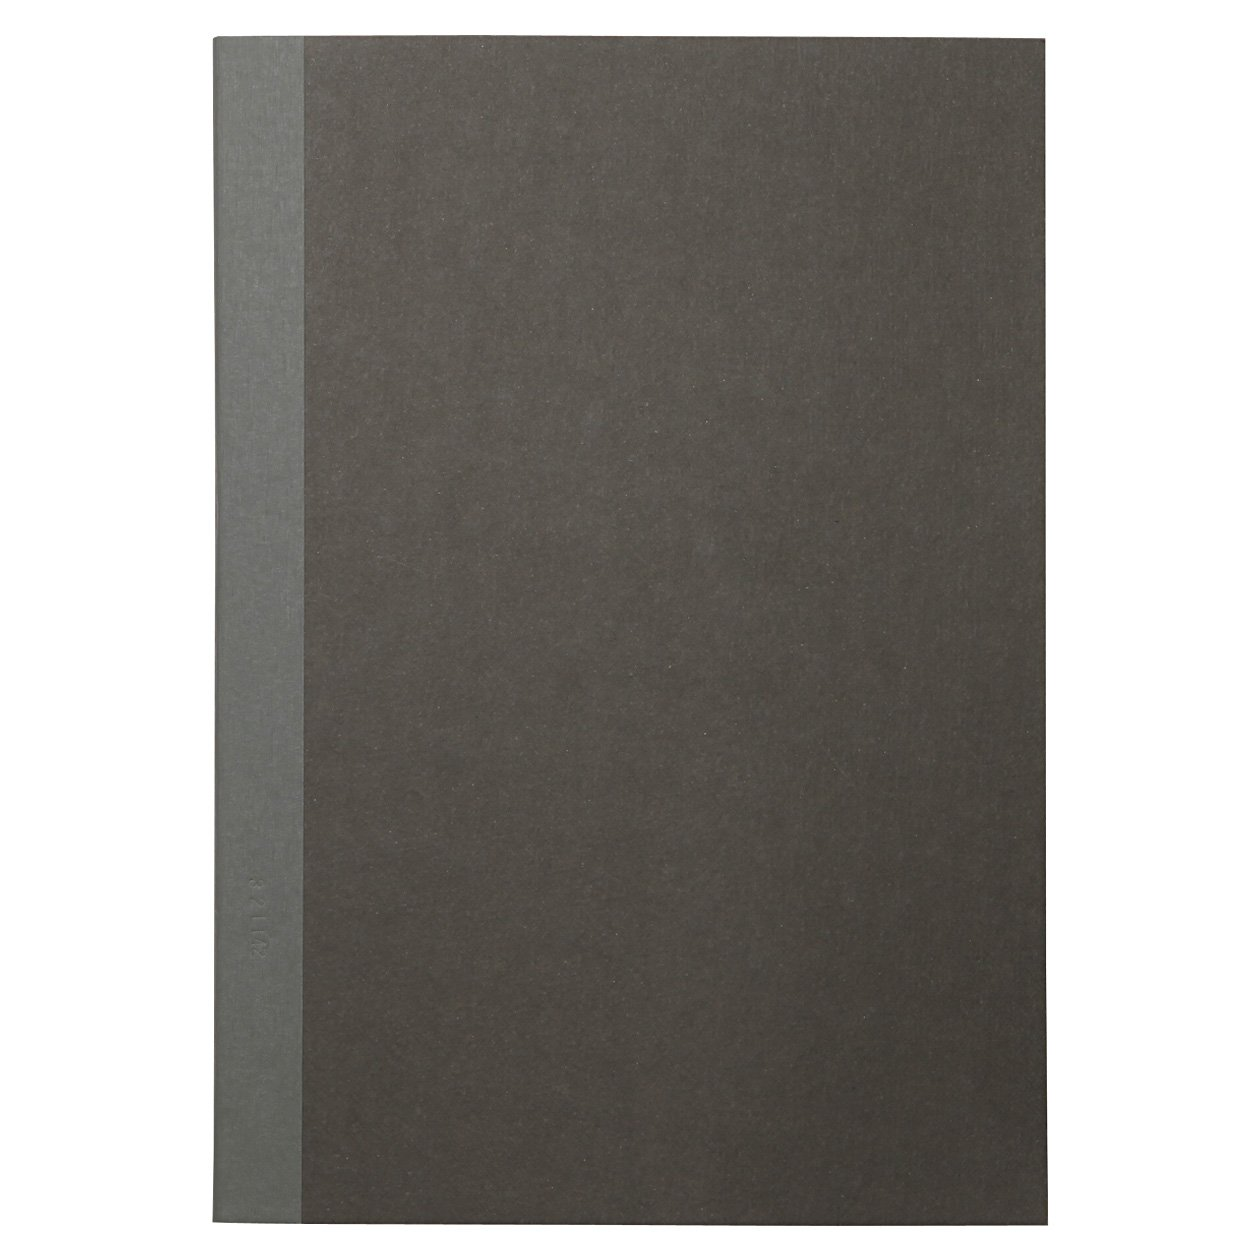 MUJI Portatil (A5, 5 mm-grid 30sheets – Pack de 5books